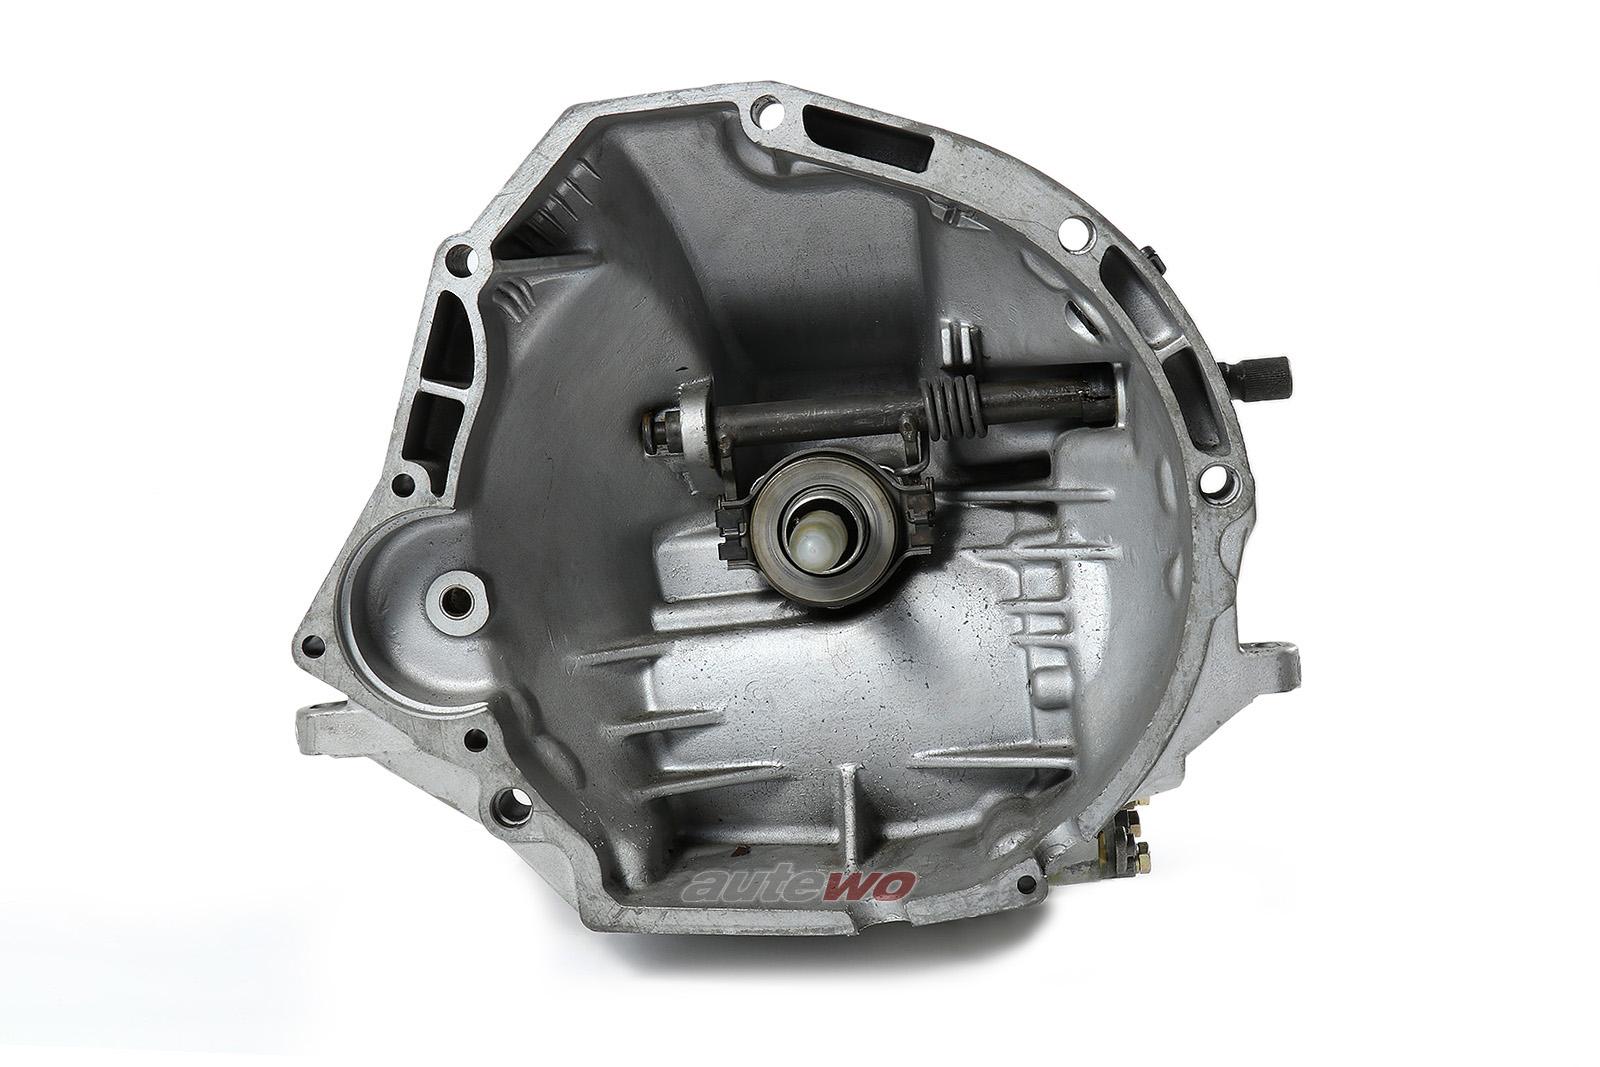 013300043AX NEU Audi/VW 80/Coupe Typ 81 1.8l 5-Gang-Schaltgetriebe 2N